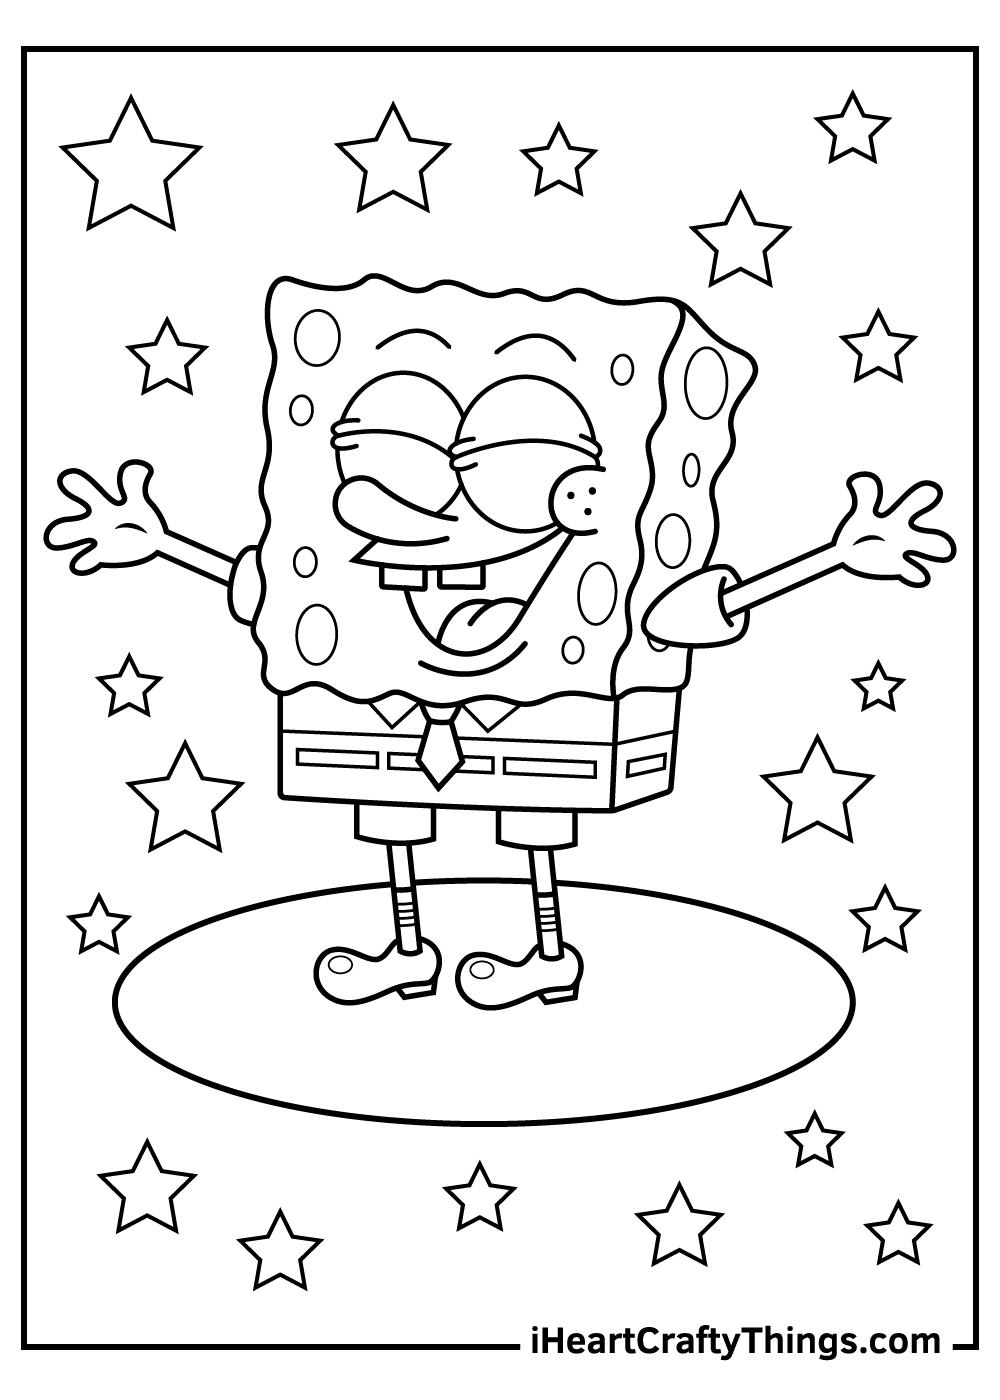 free printable spongebob coloring pages